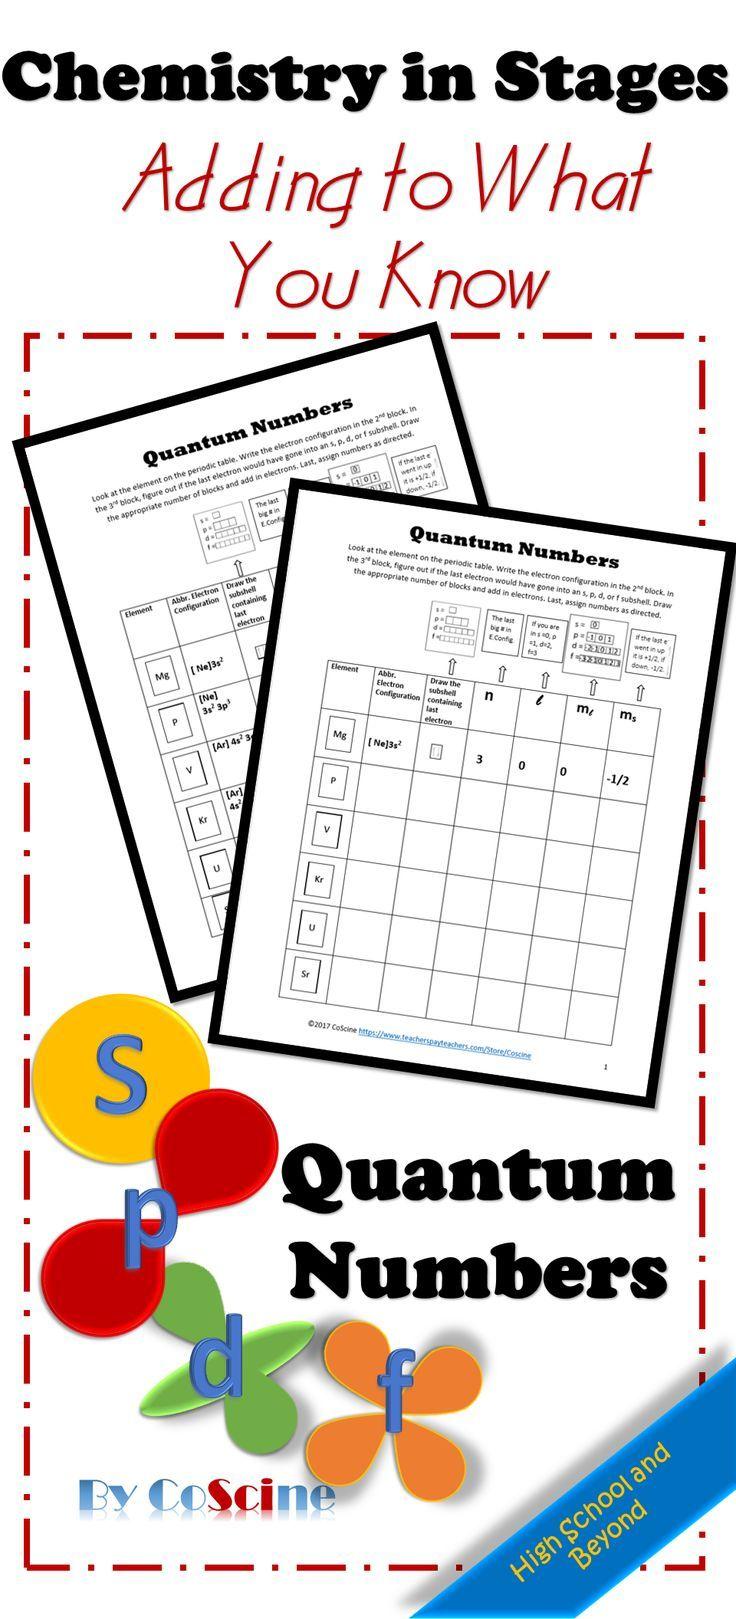 Quantum Numbers Spdf Super Teacher Worksheets Chemistry Worksheets High School Chemistry